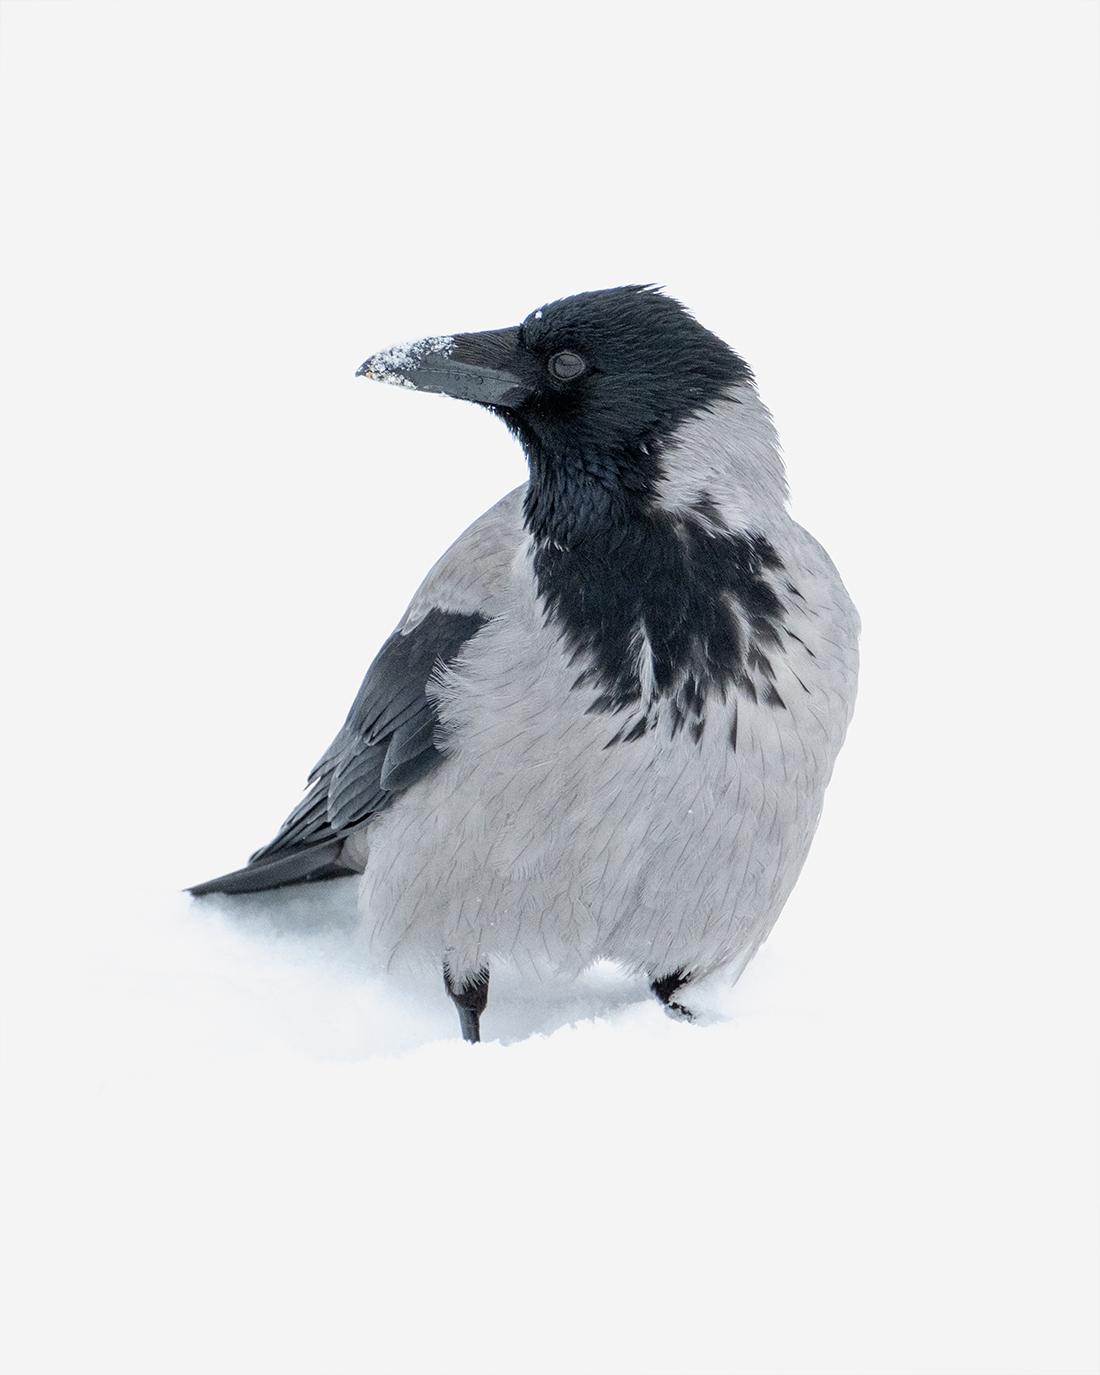 DSCF9434-3-WEB-hooded-crow-kråke-ciliestad-trondheim